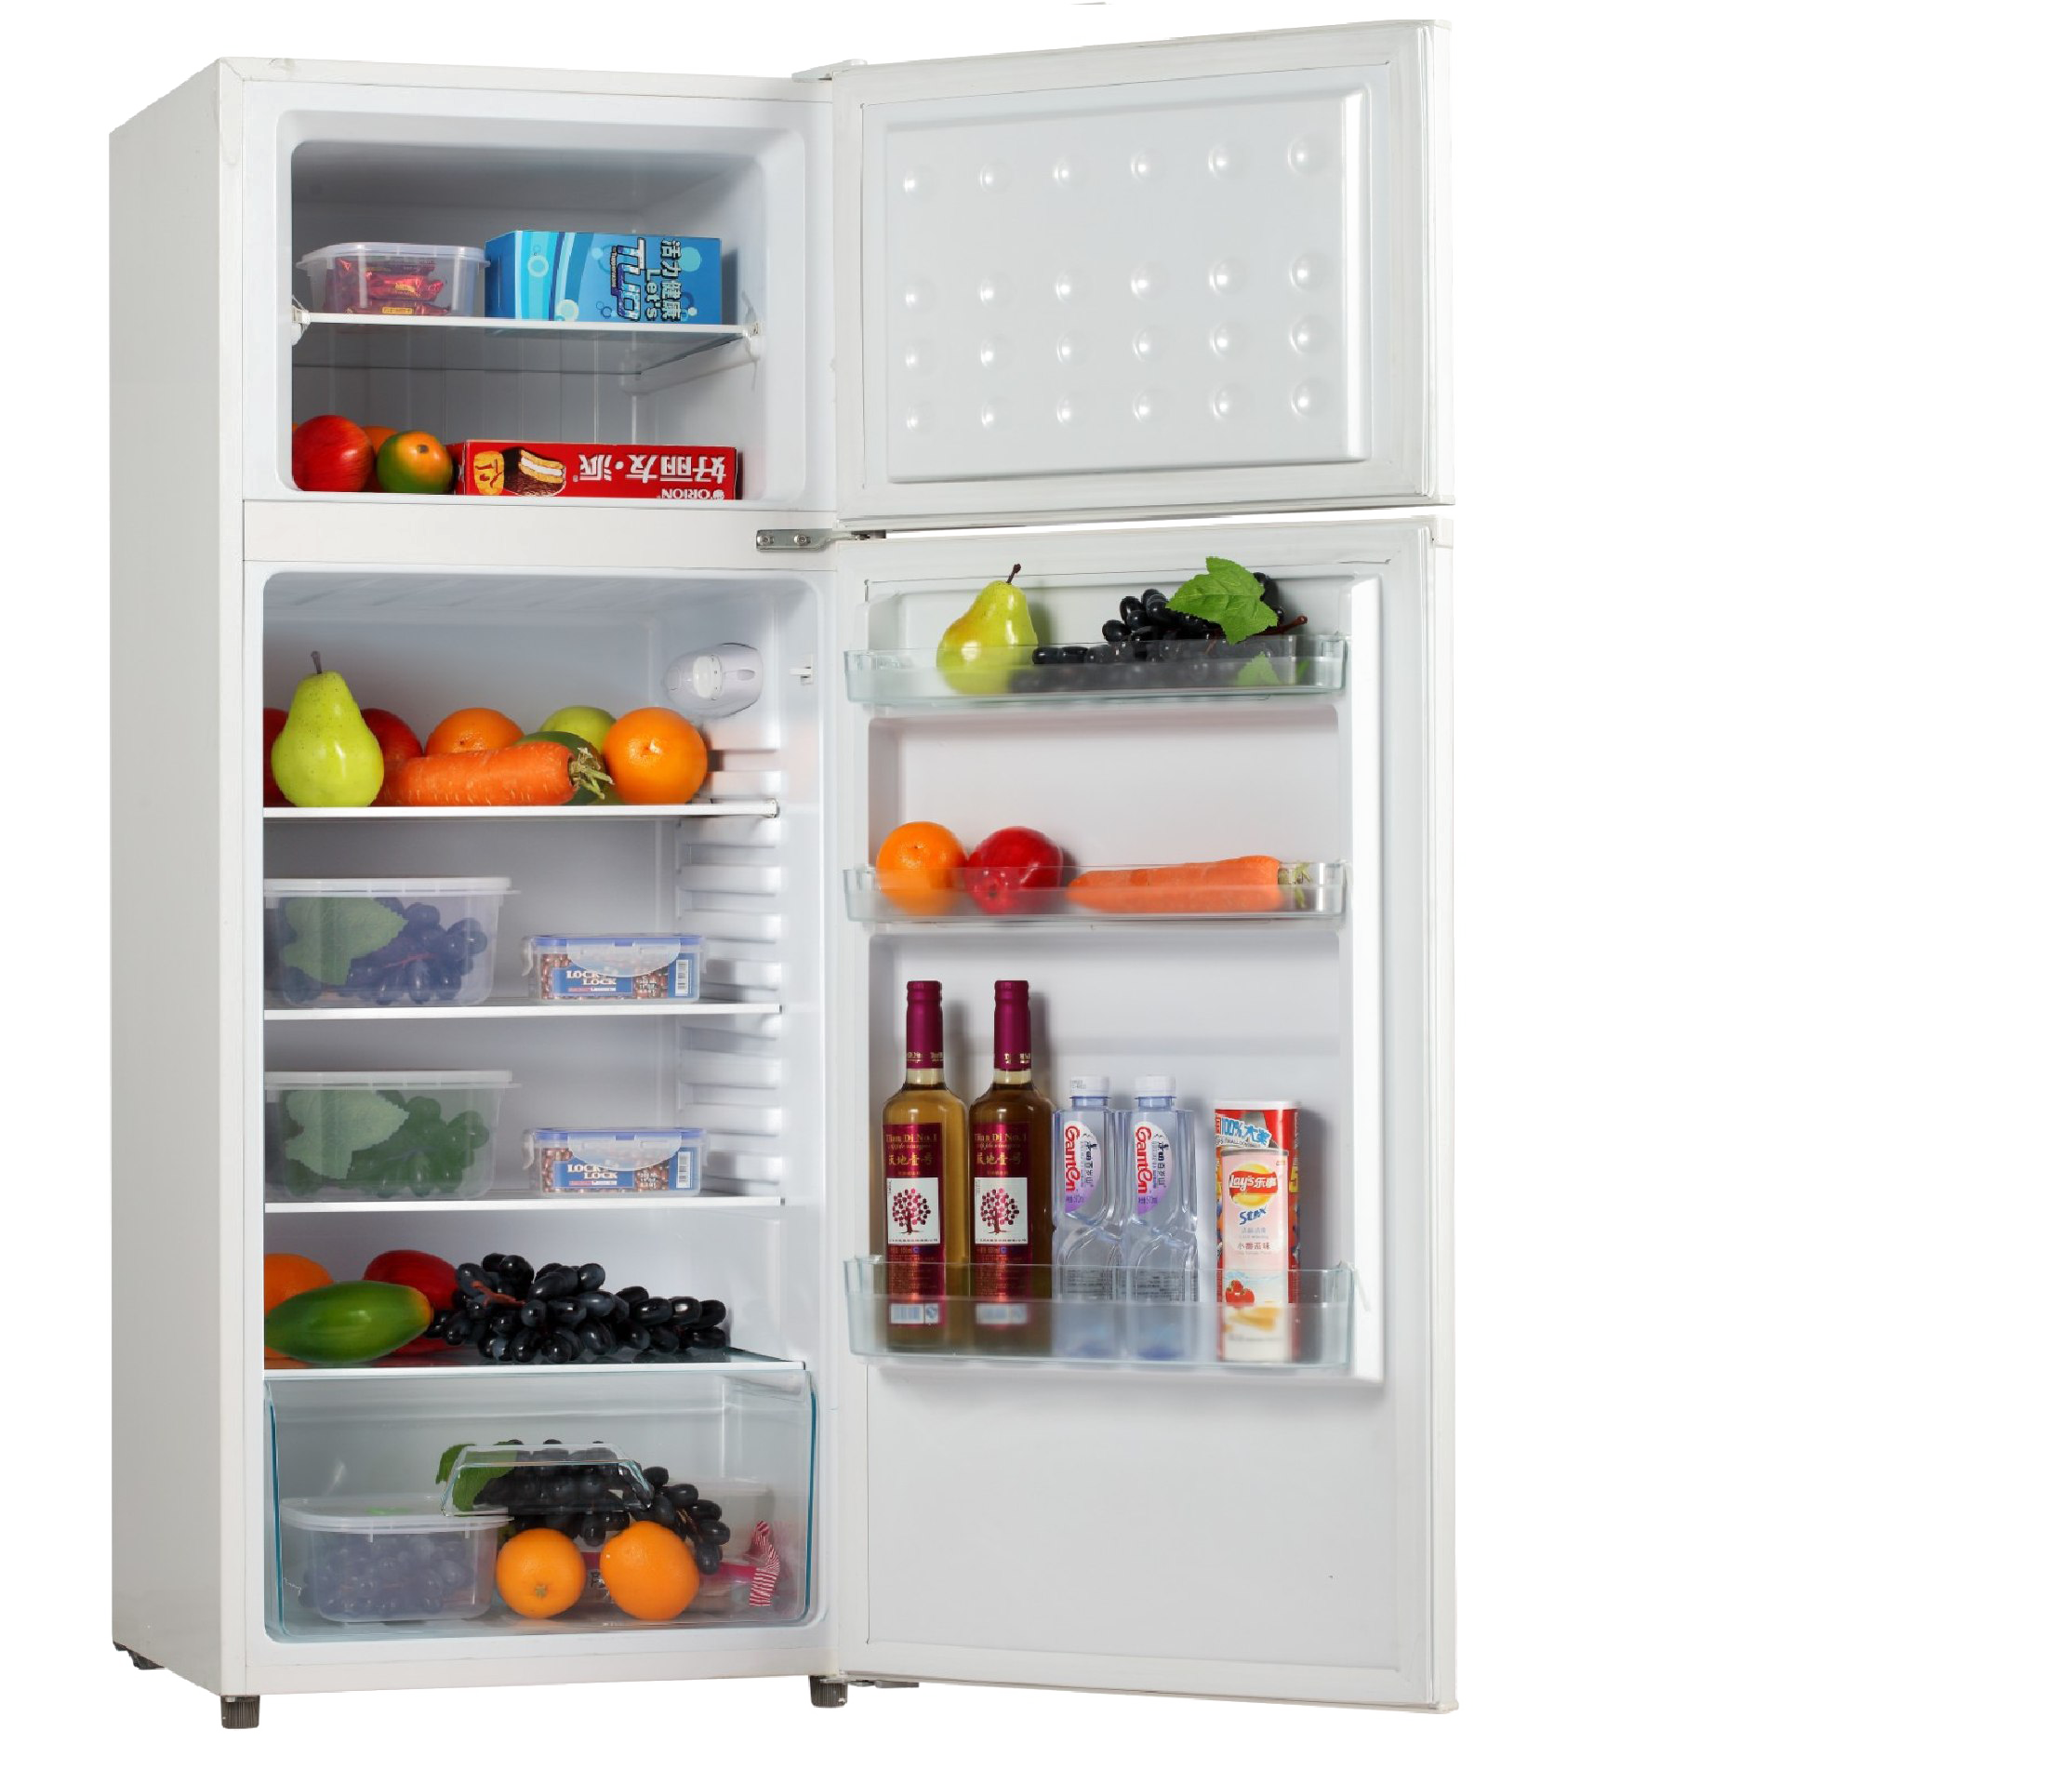 Refrigerator PNG Background Image.